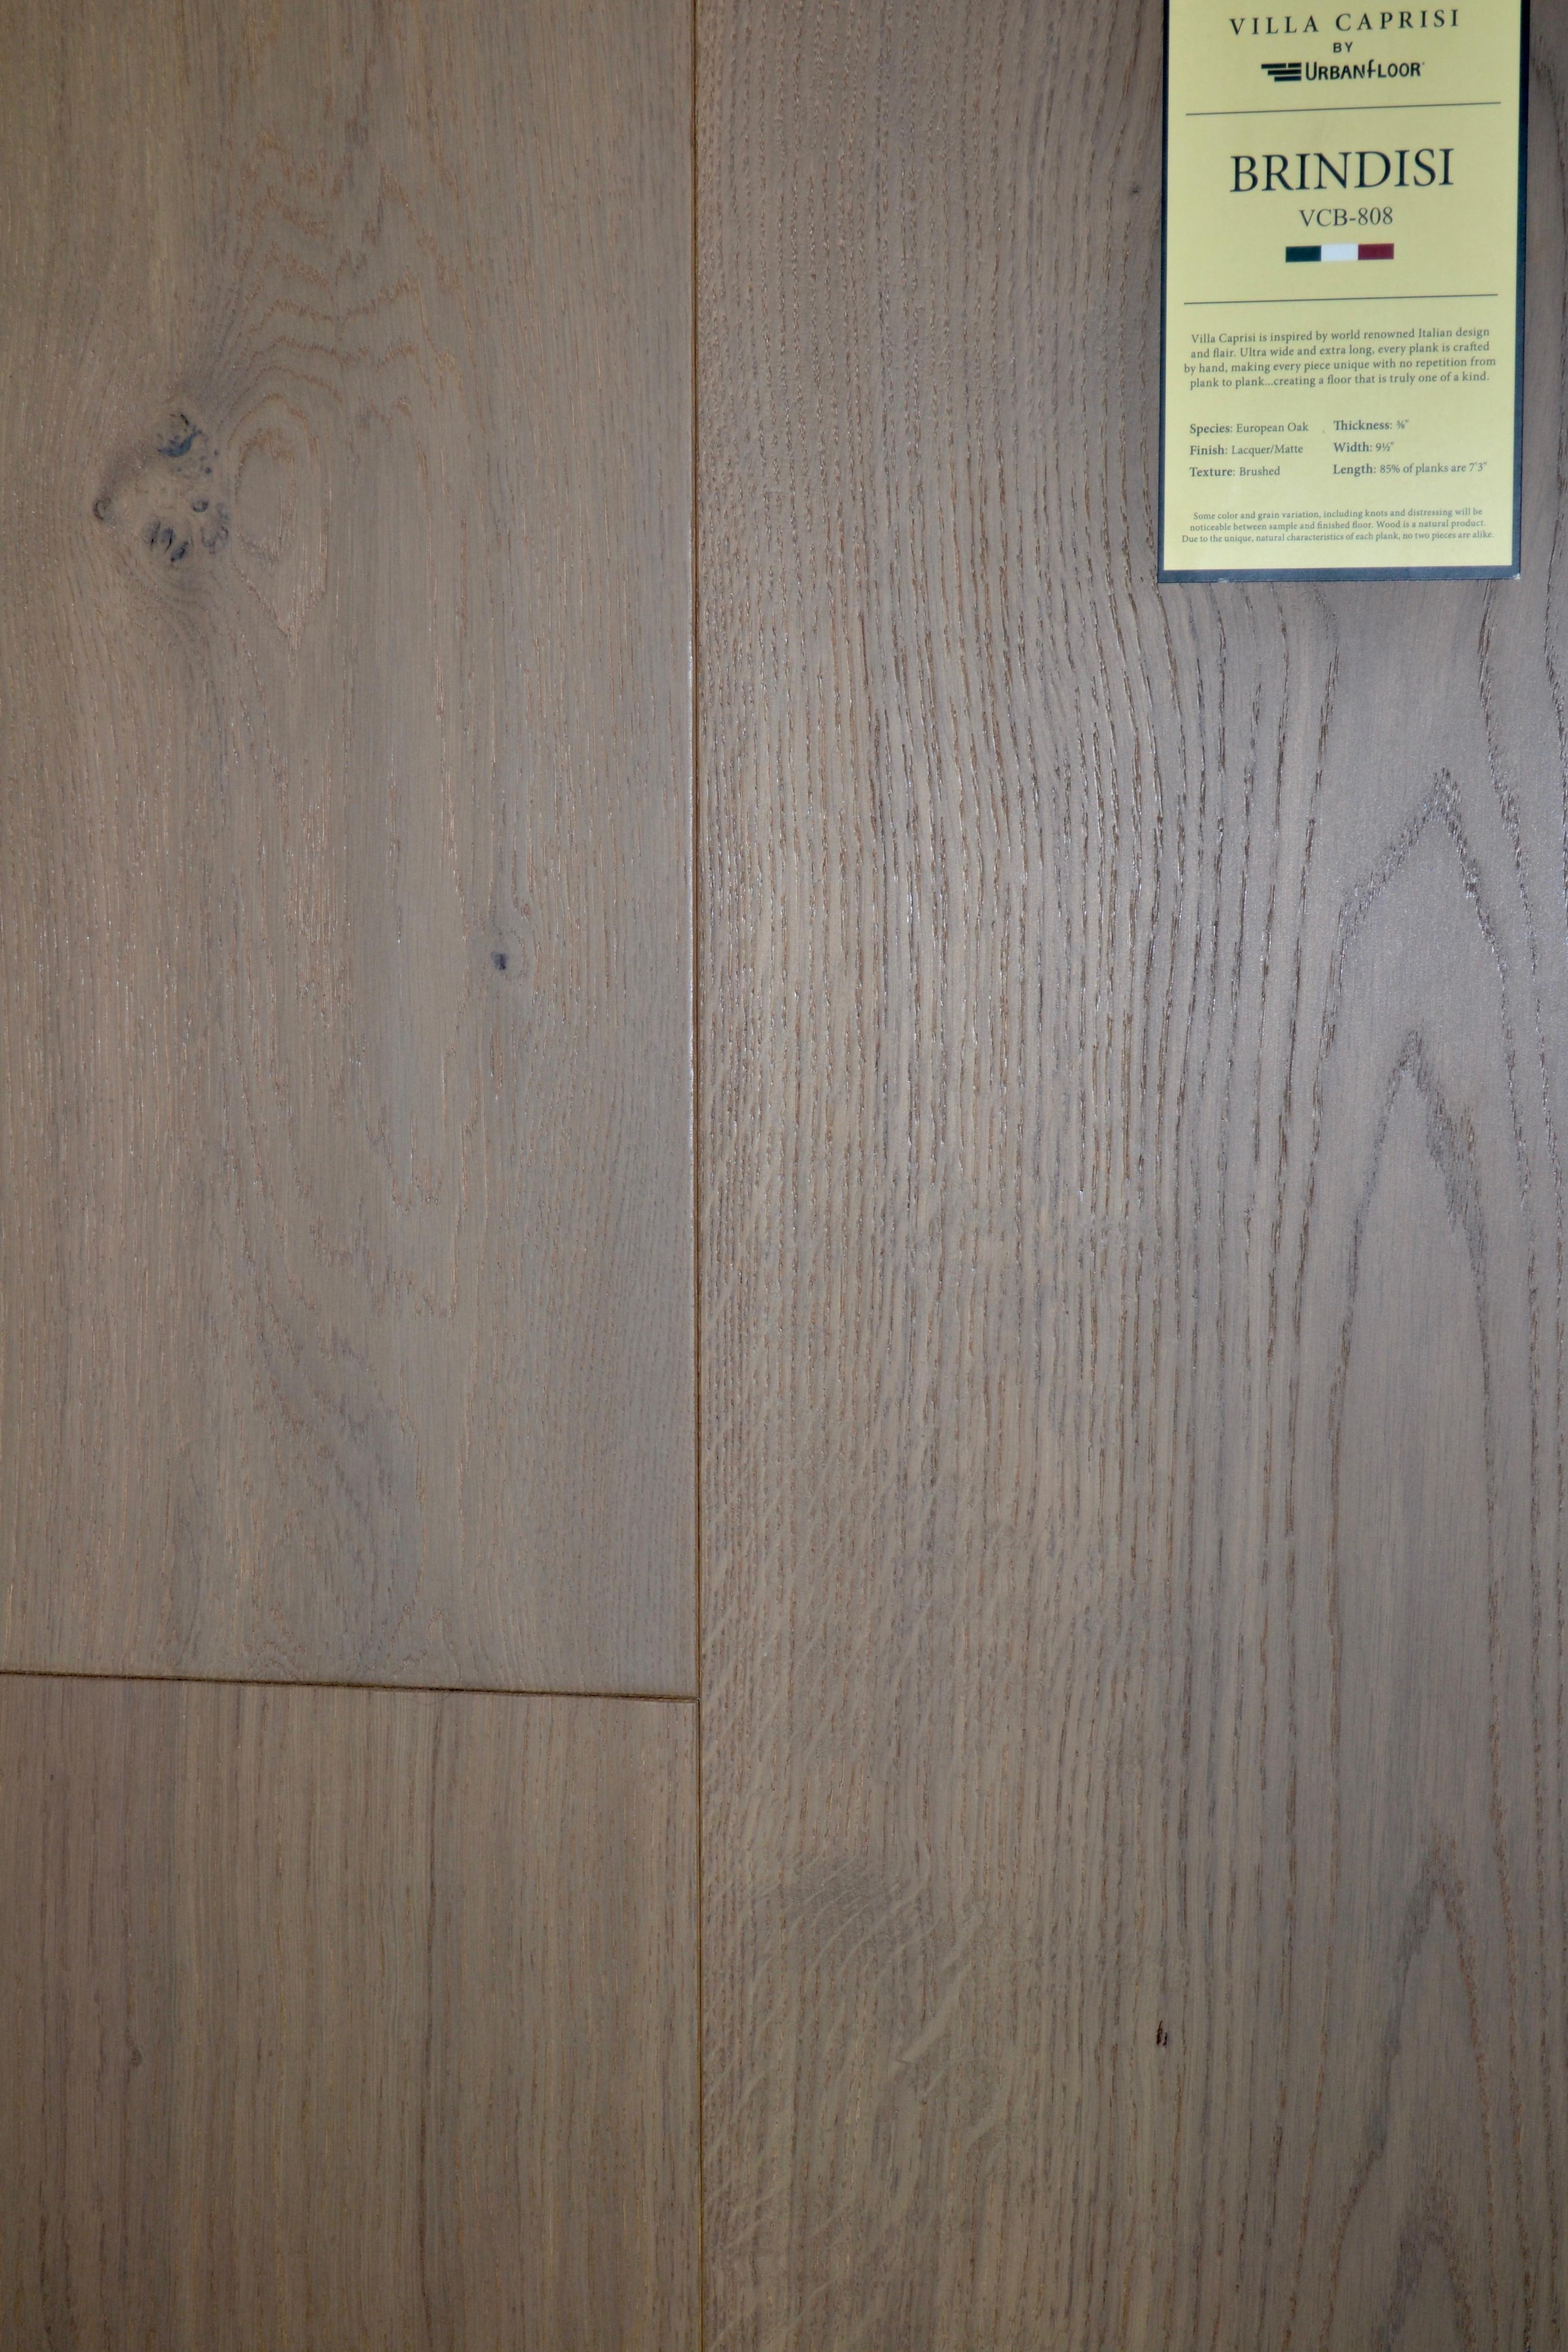 oak hardwood flooring colors of villa caprisi fine european hardwood millennium hardwood inside european style inspired designer oak floor brindisi by villa caprisi